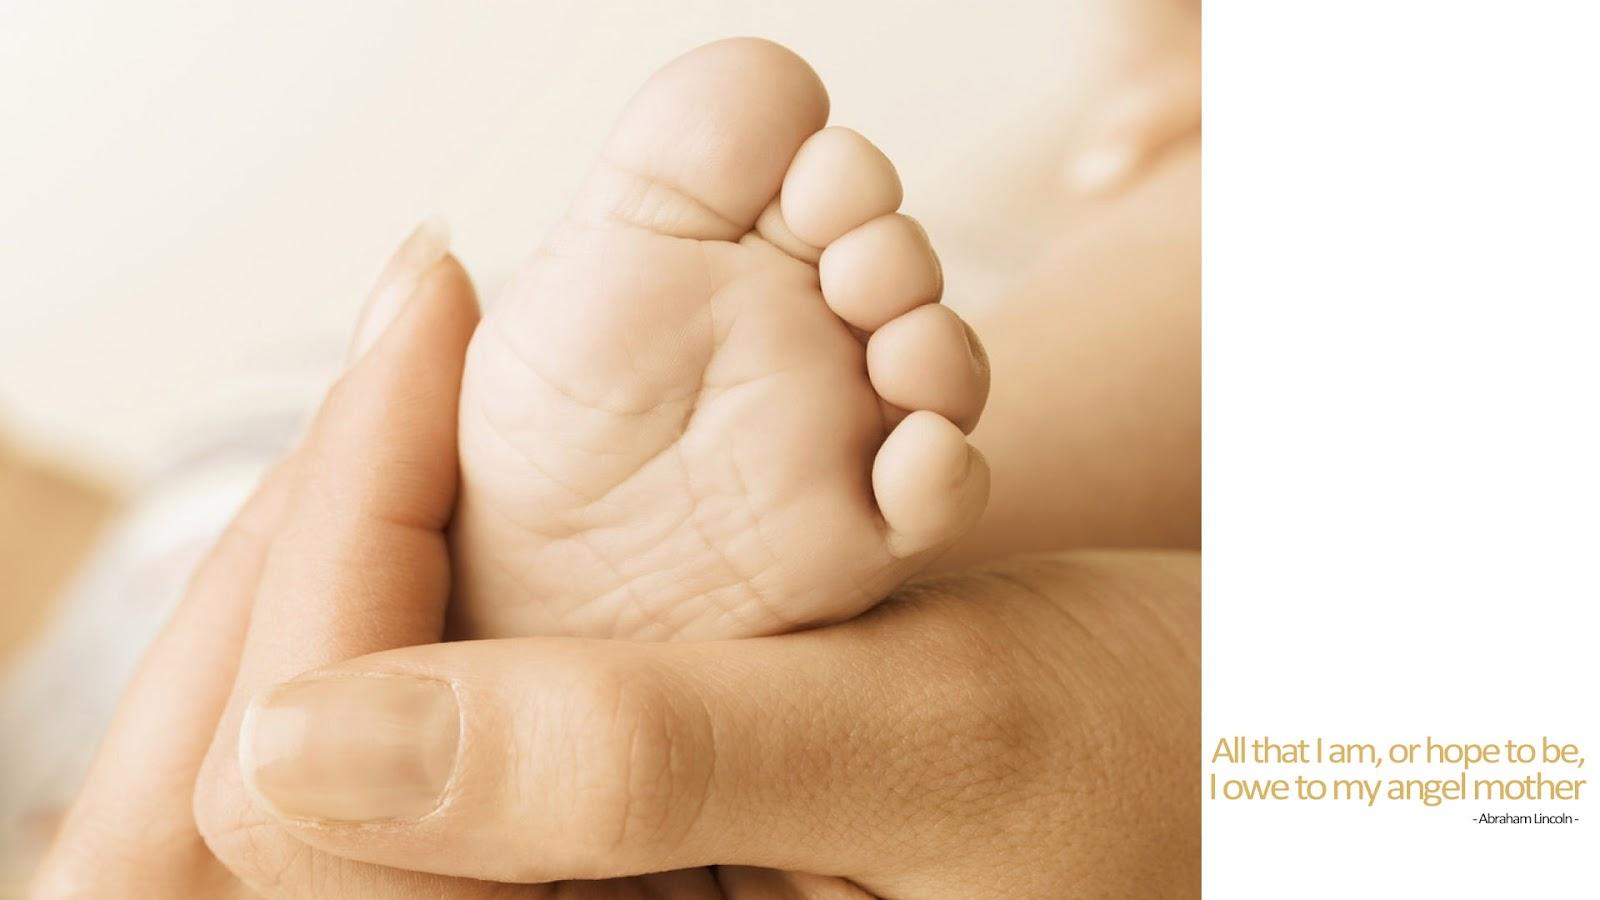 http://4.bp.blogspot.com/-g8OGIie1CVk/T5i4IxkxyhI/AAAAAAAADY8/Nzng__7QSr8/s1600/Mothers-Day-Quote-Wallpaper.jpg